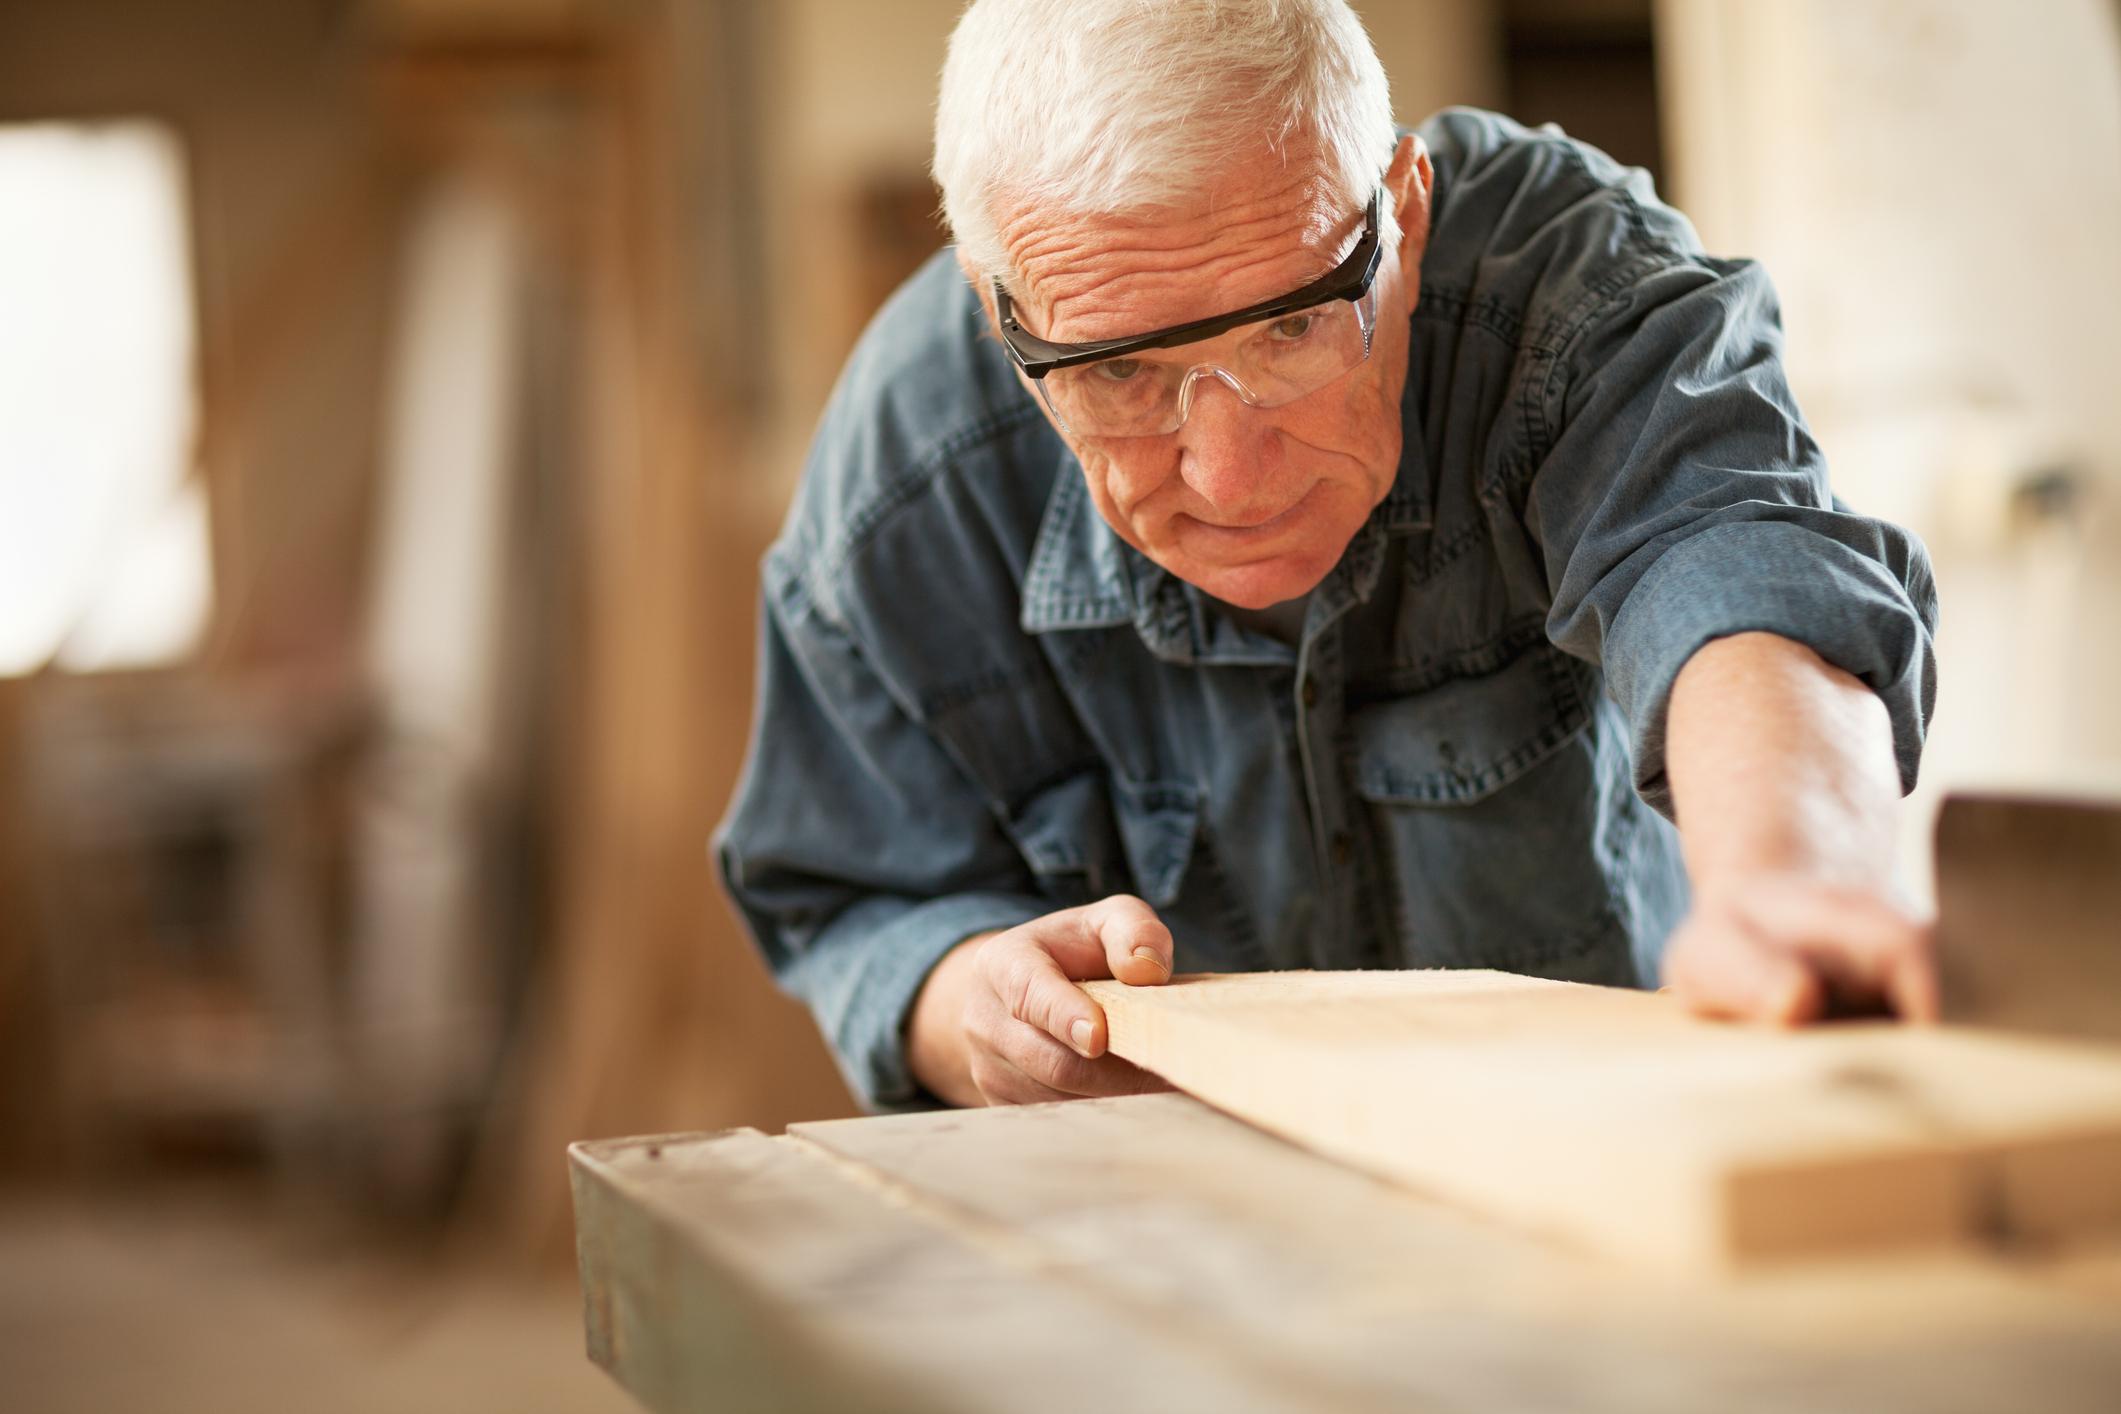 A senior man cutting lumber in a wood shop.